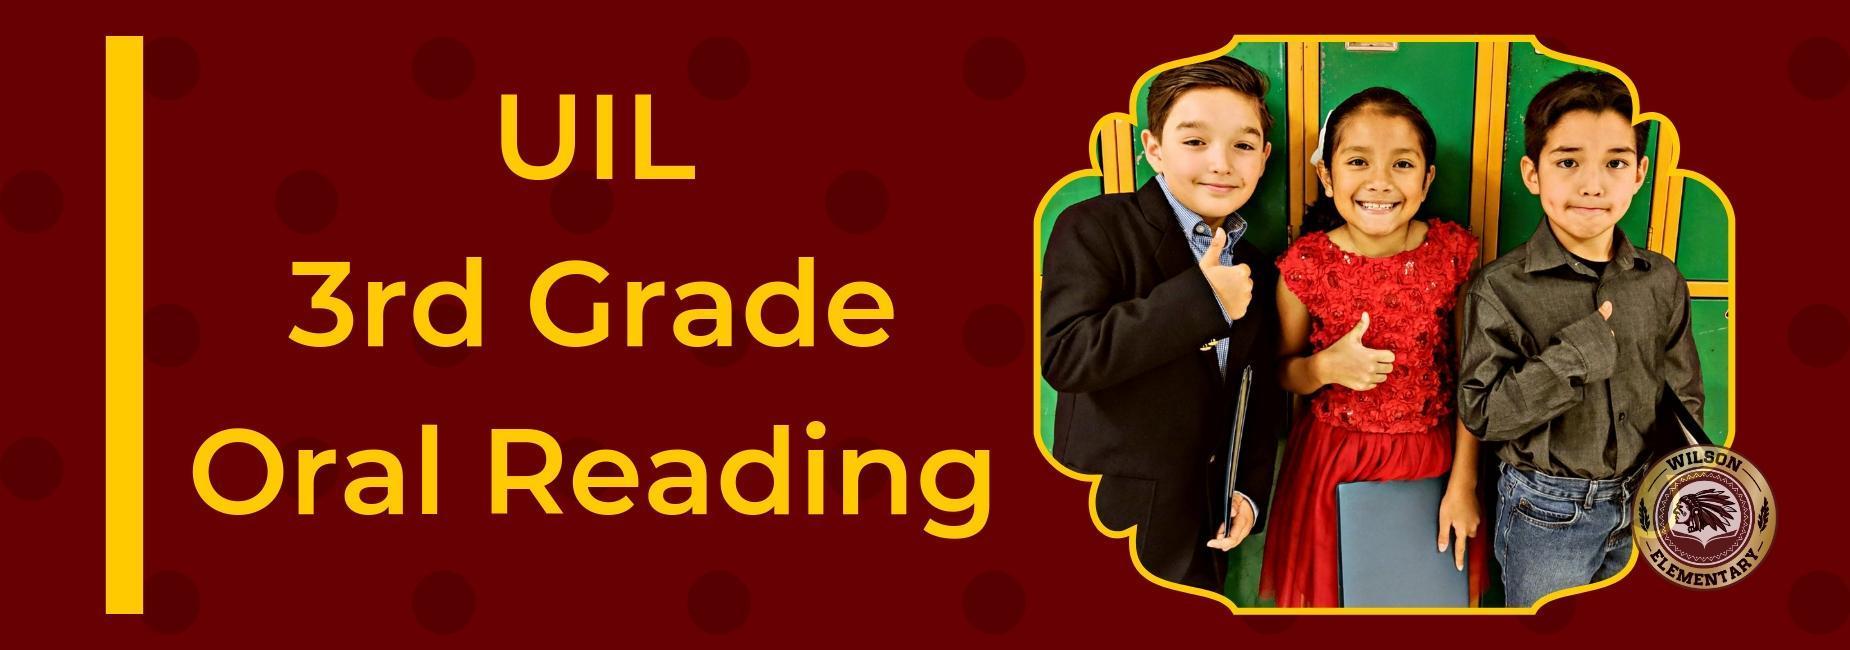 3rd Grade Oral Reading